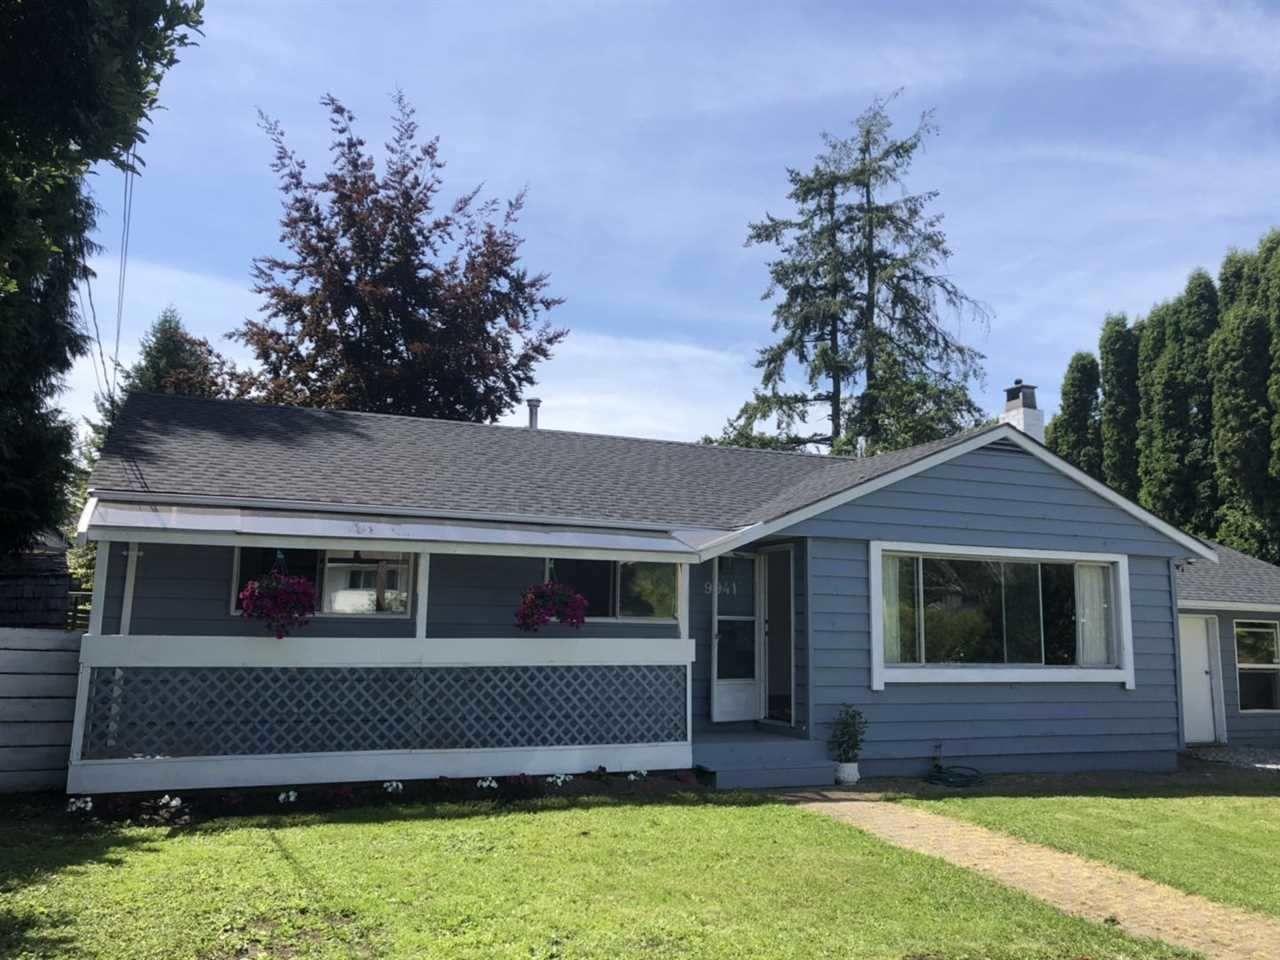 Main Photo: 9941 124A Street in Surrey: Cedar Hills House for sale (North Surrey)  : MLS®# R2508931